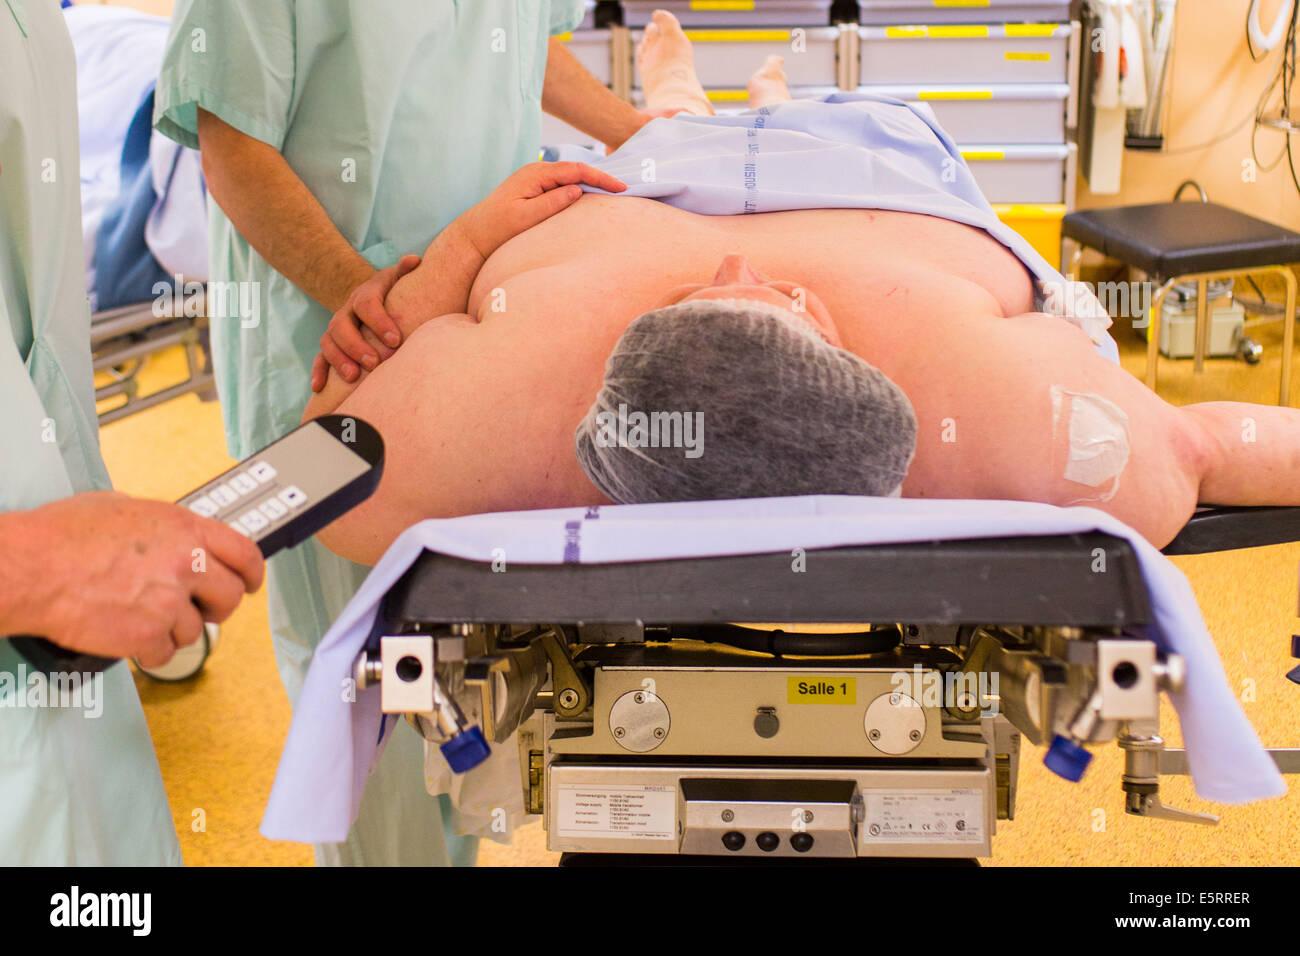 Obese female patient prior to Laparoscopic Sleeve Gastrectomy, Limoges hospital. - Stock Image